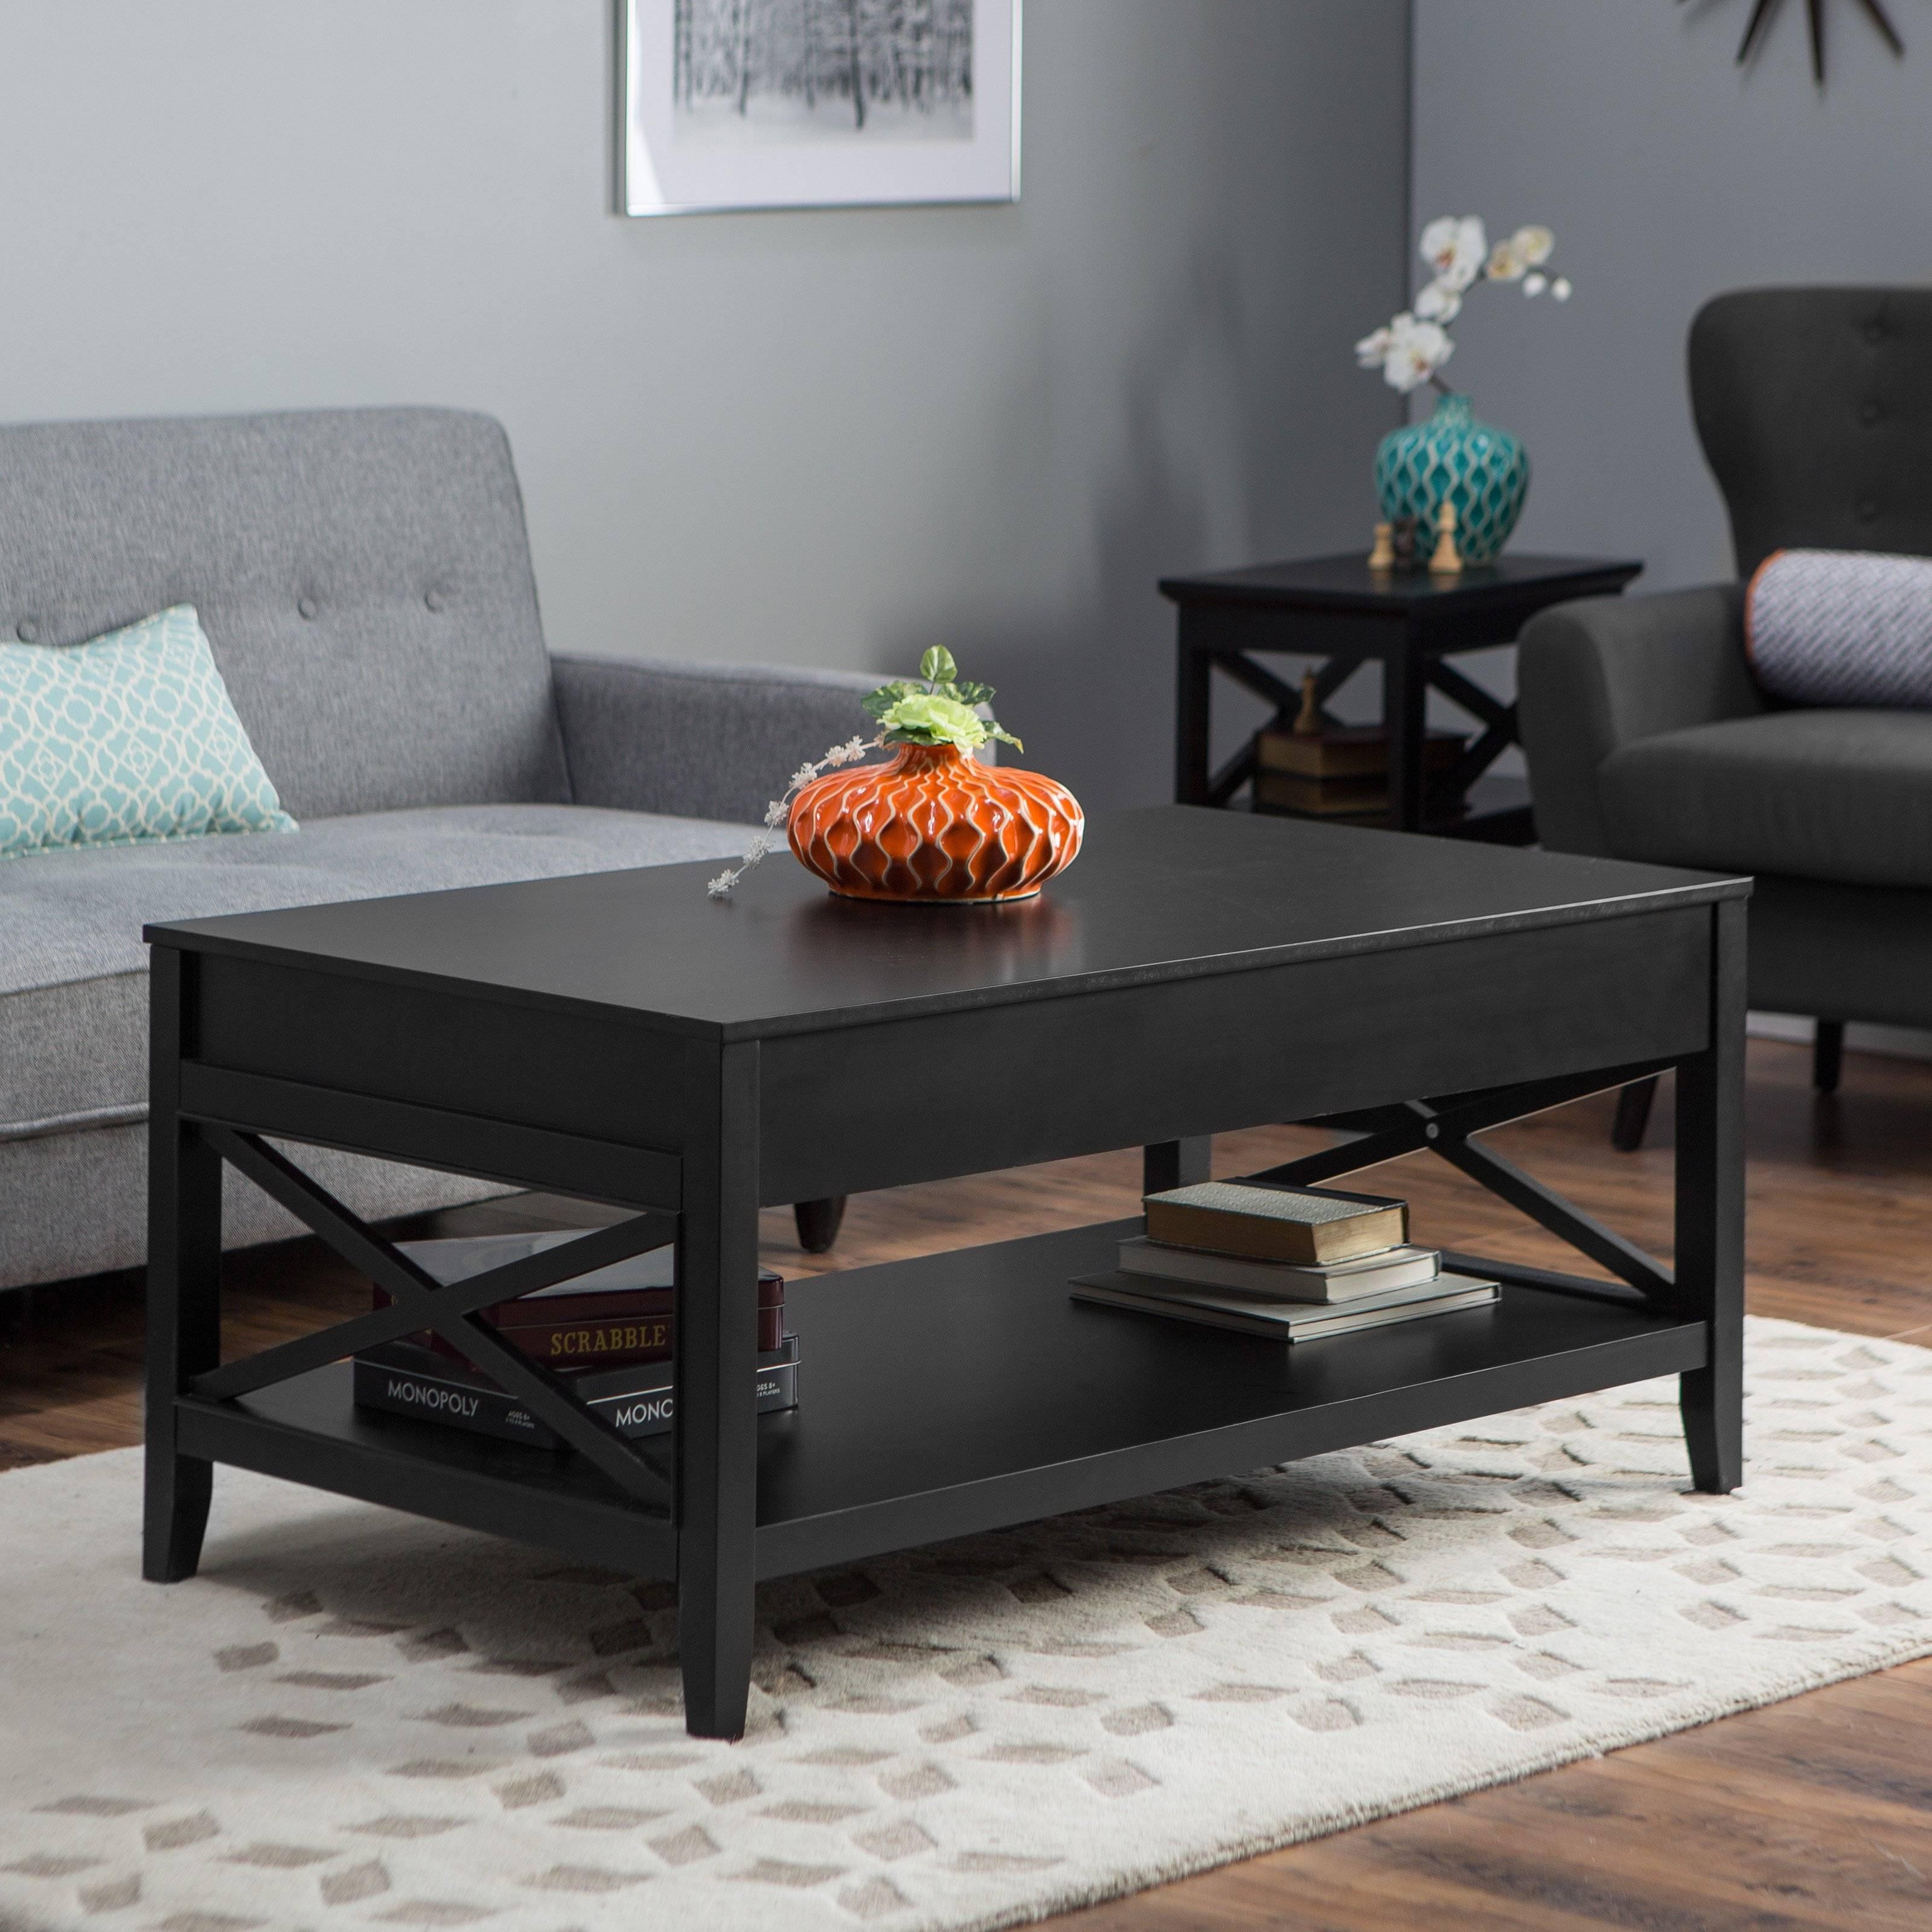 Belham Living Hampton Storage And Lift Top Coffee Table | Hayneedle regarding Black Coffee Tables (Image 3 of 30)